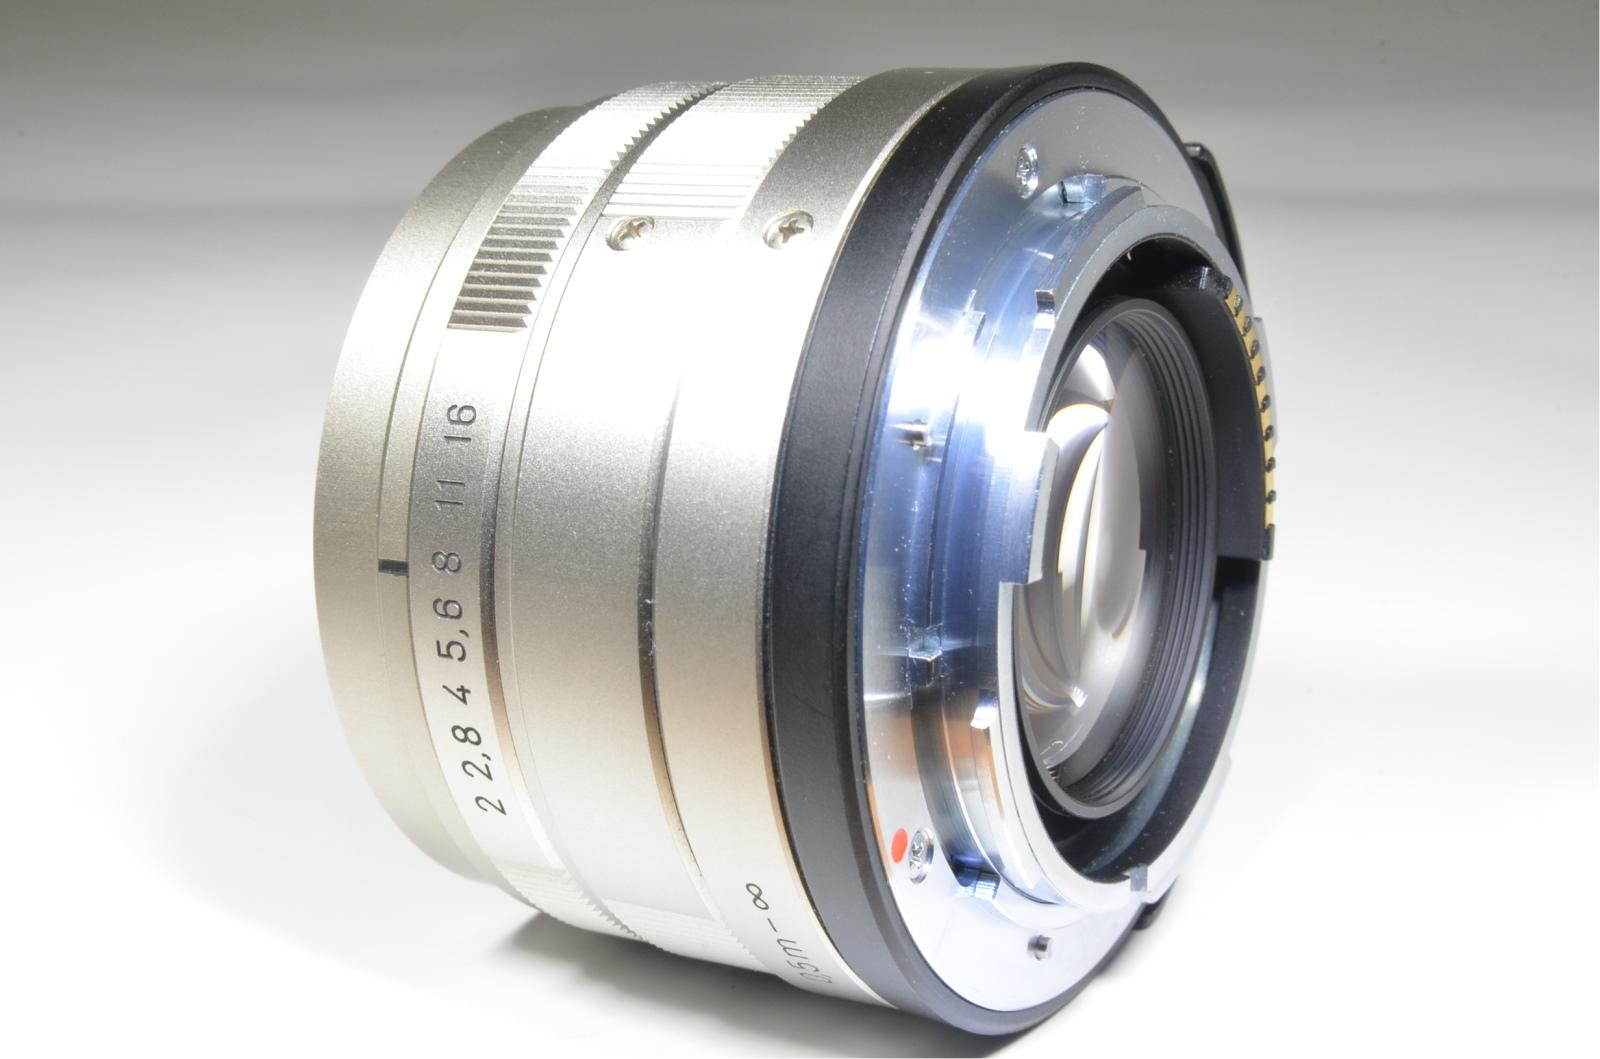 contax g2 camera / planar 45mm f2 / biogon 28mm f2.8 / sonnar 90mm f2.8